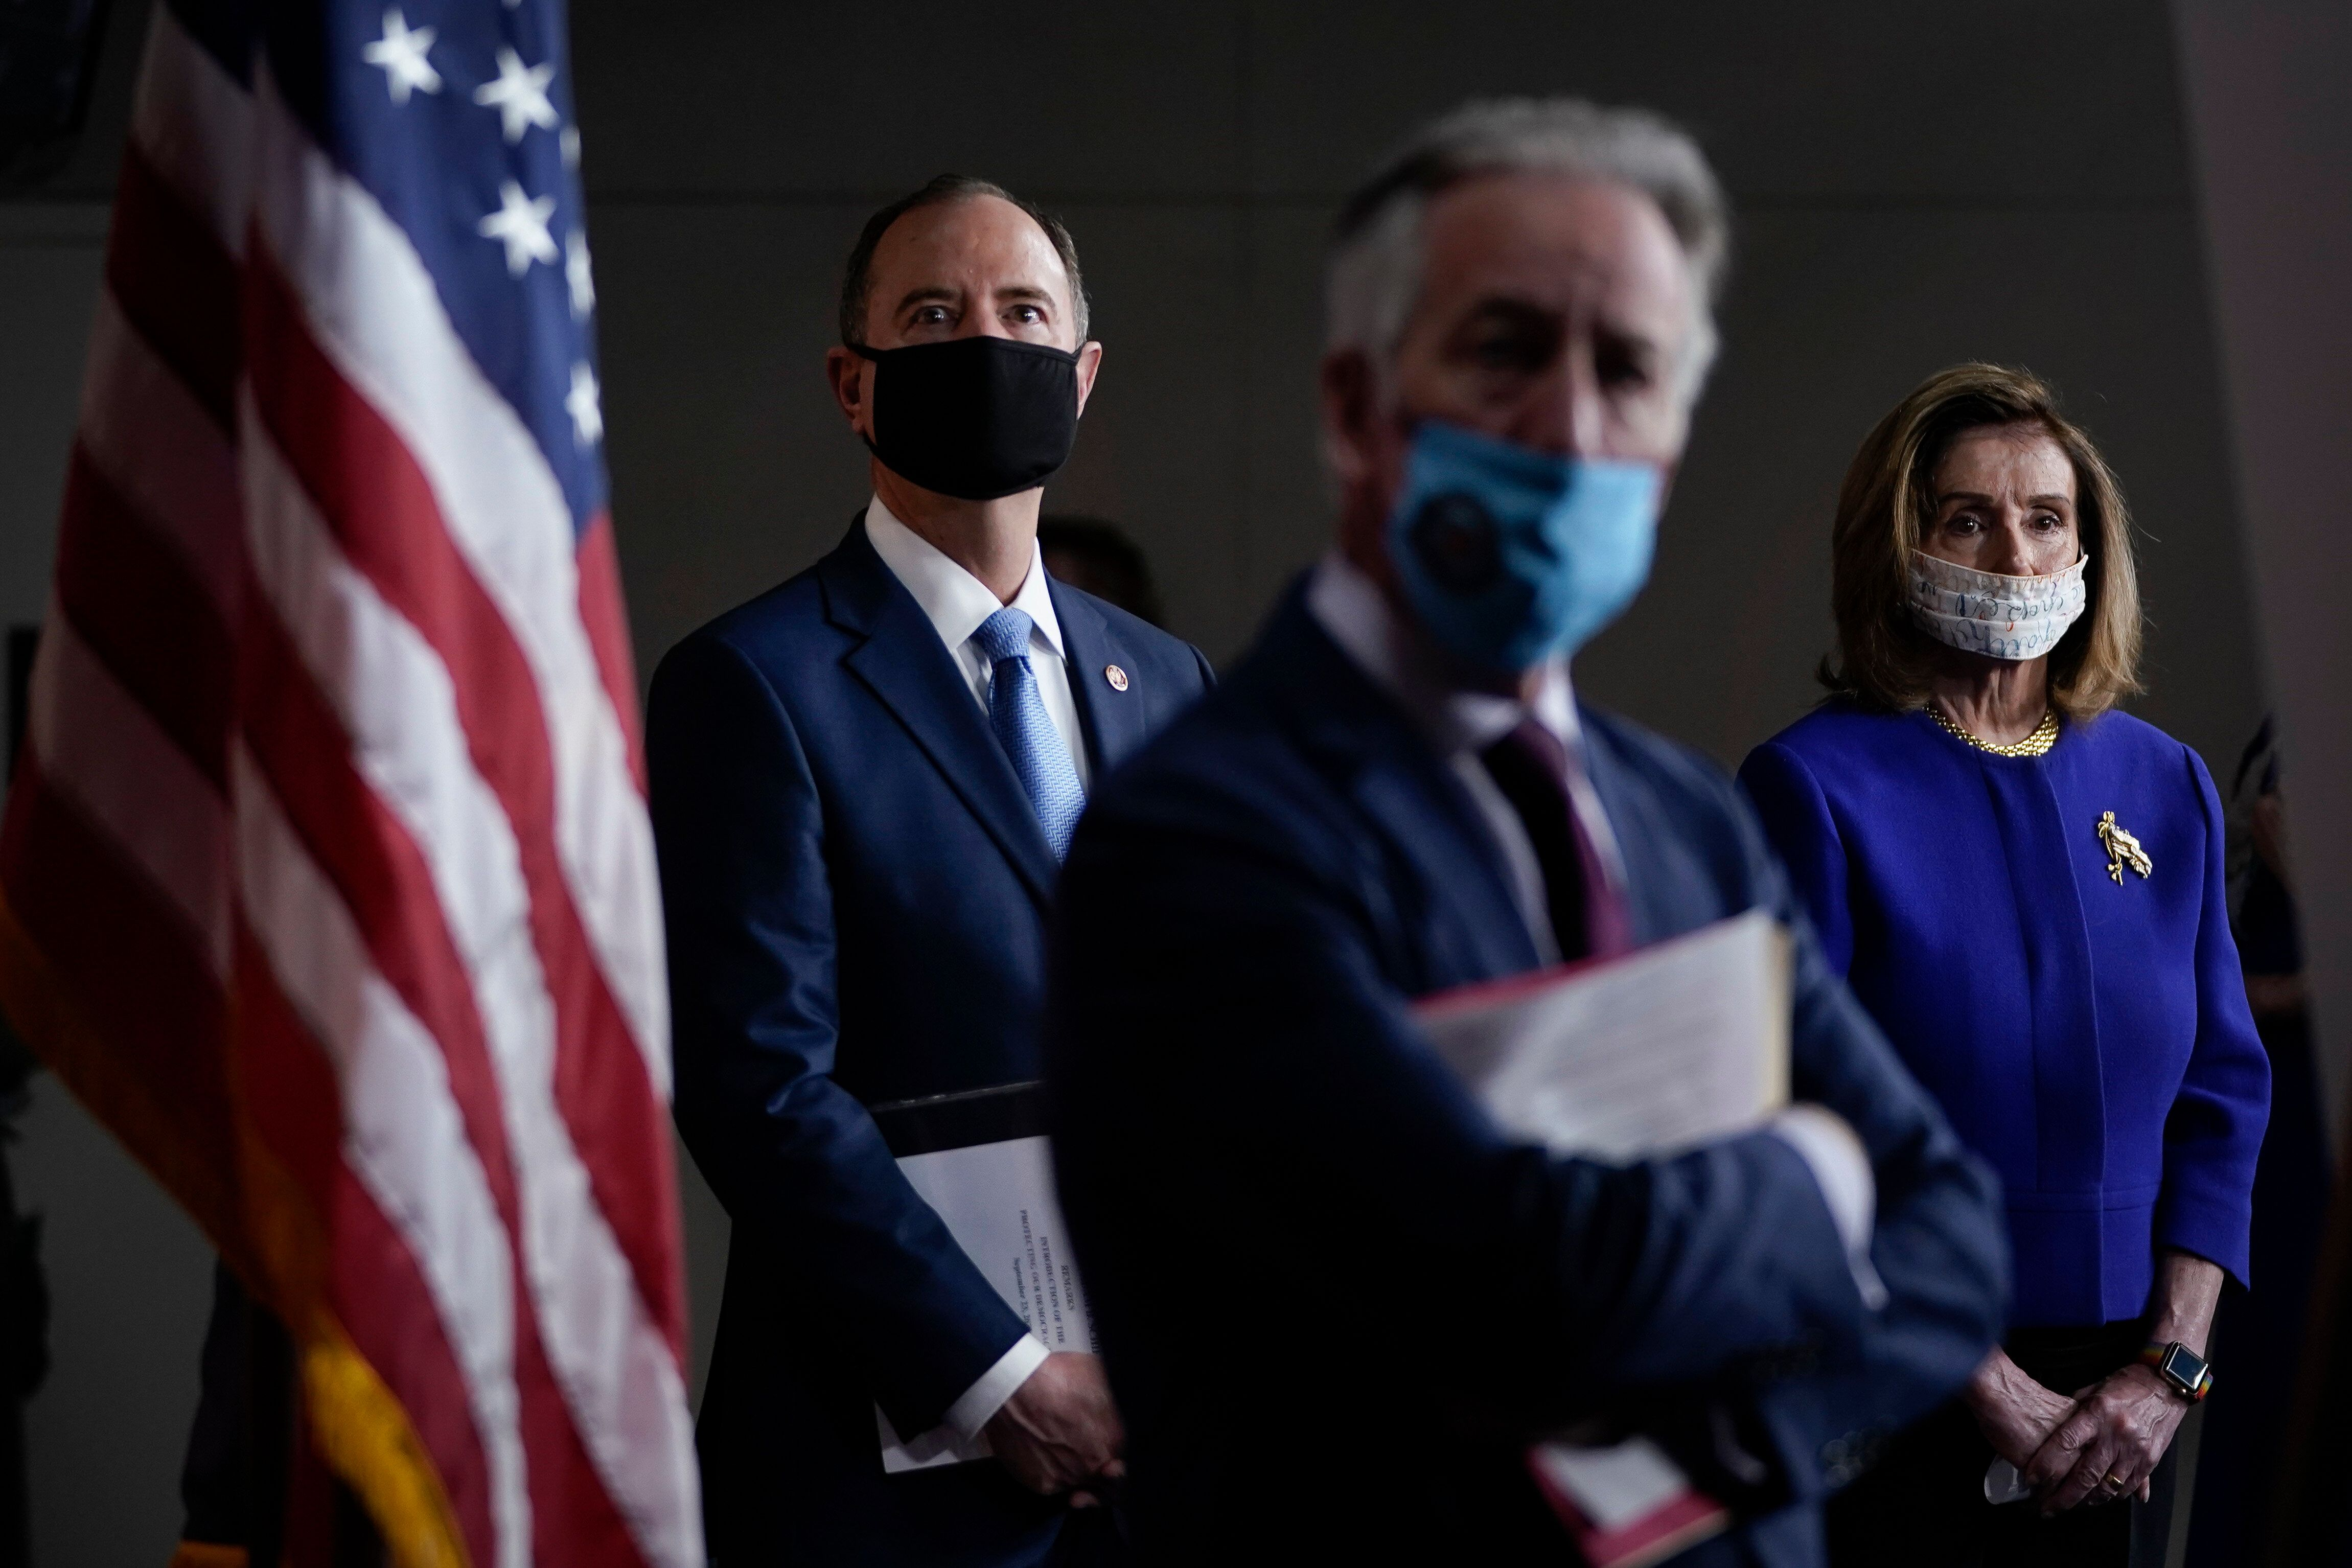 Rep. Adam Schiff (D-Calif.), Rep. Richard Neal (D-Mass.) and Speaker of the House Nancy Pelosi (D-Calif.) attend a news confe